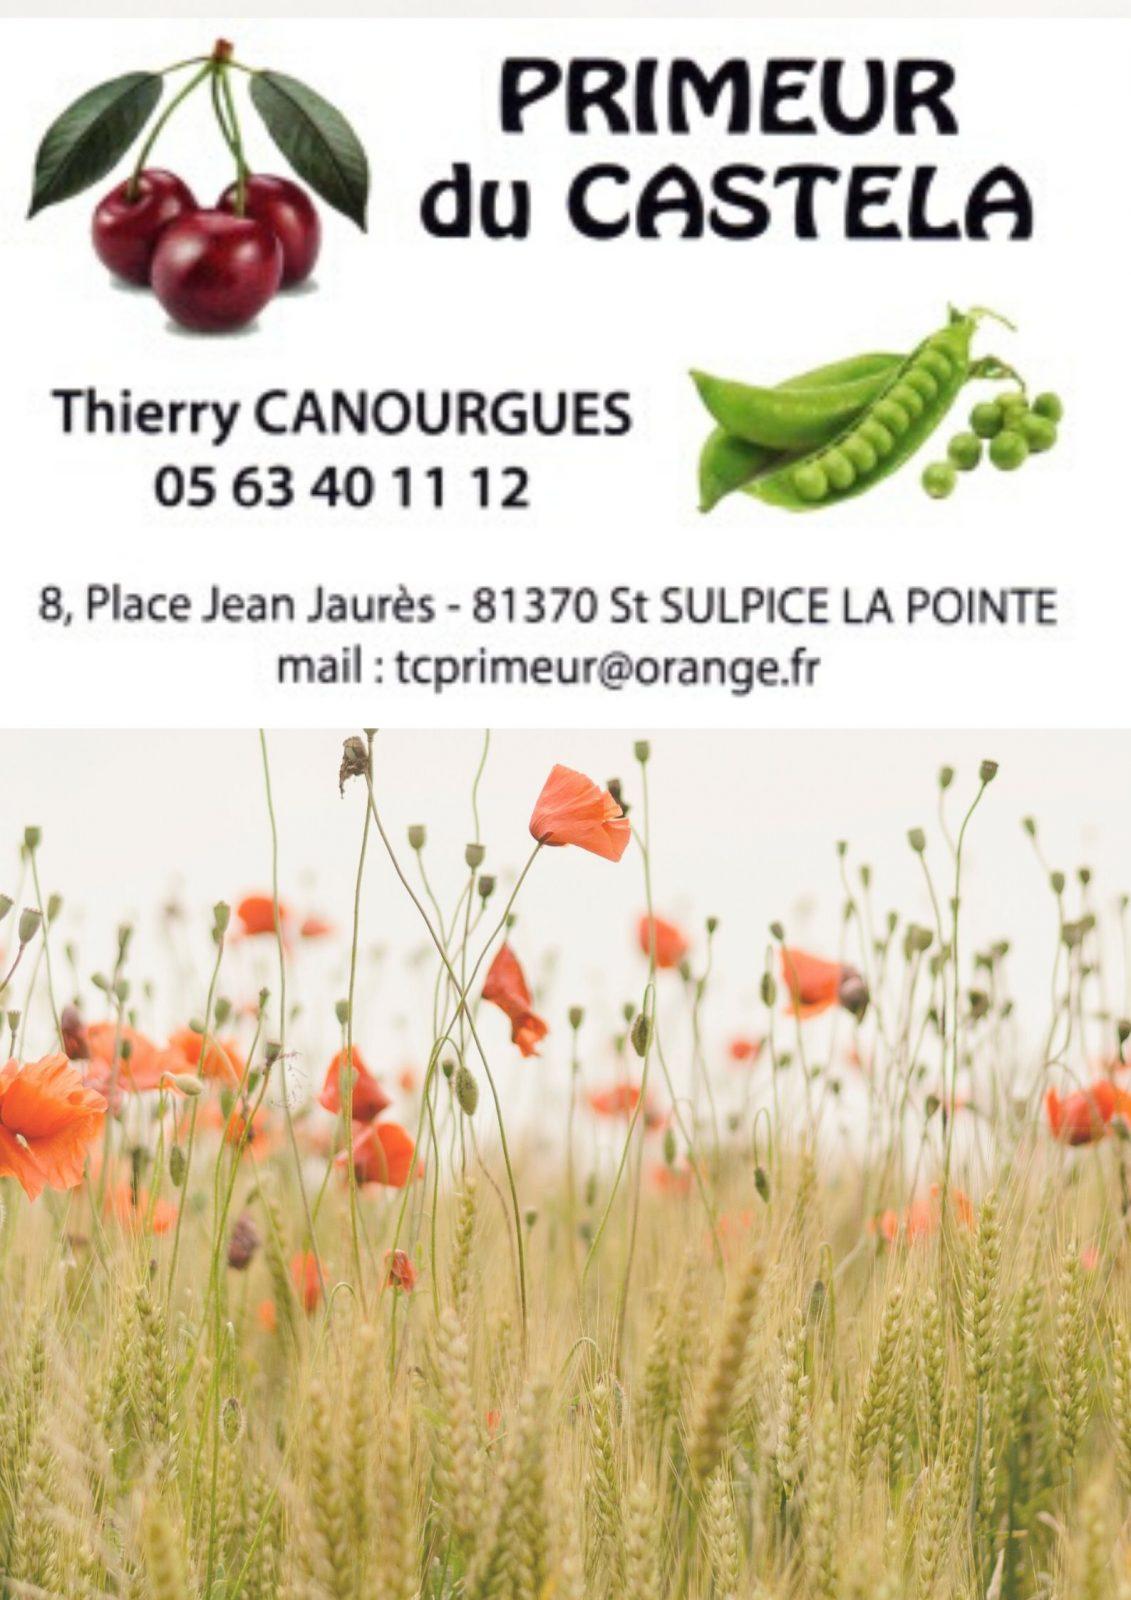 Le PRimeur du Castela – Saint-Sulpice – Tarn – 81